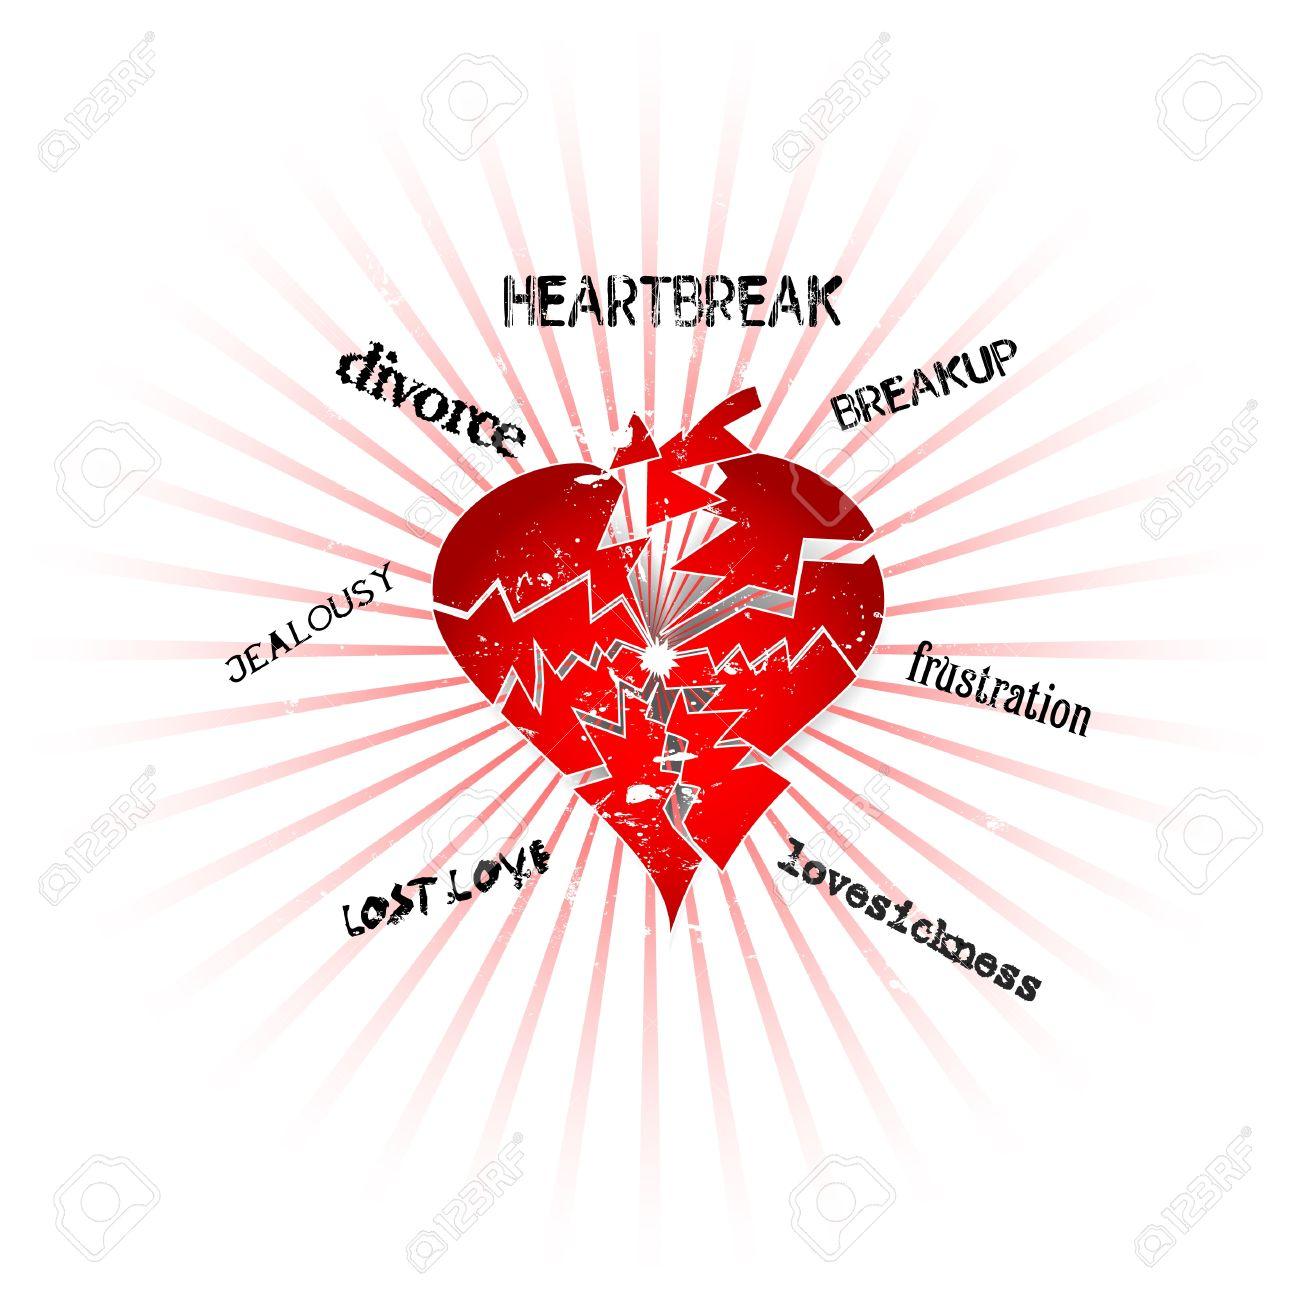 Love and Heartbreak